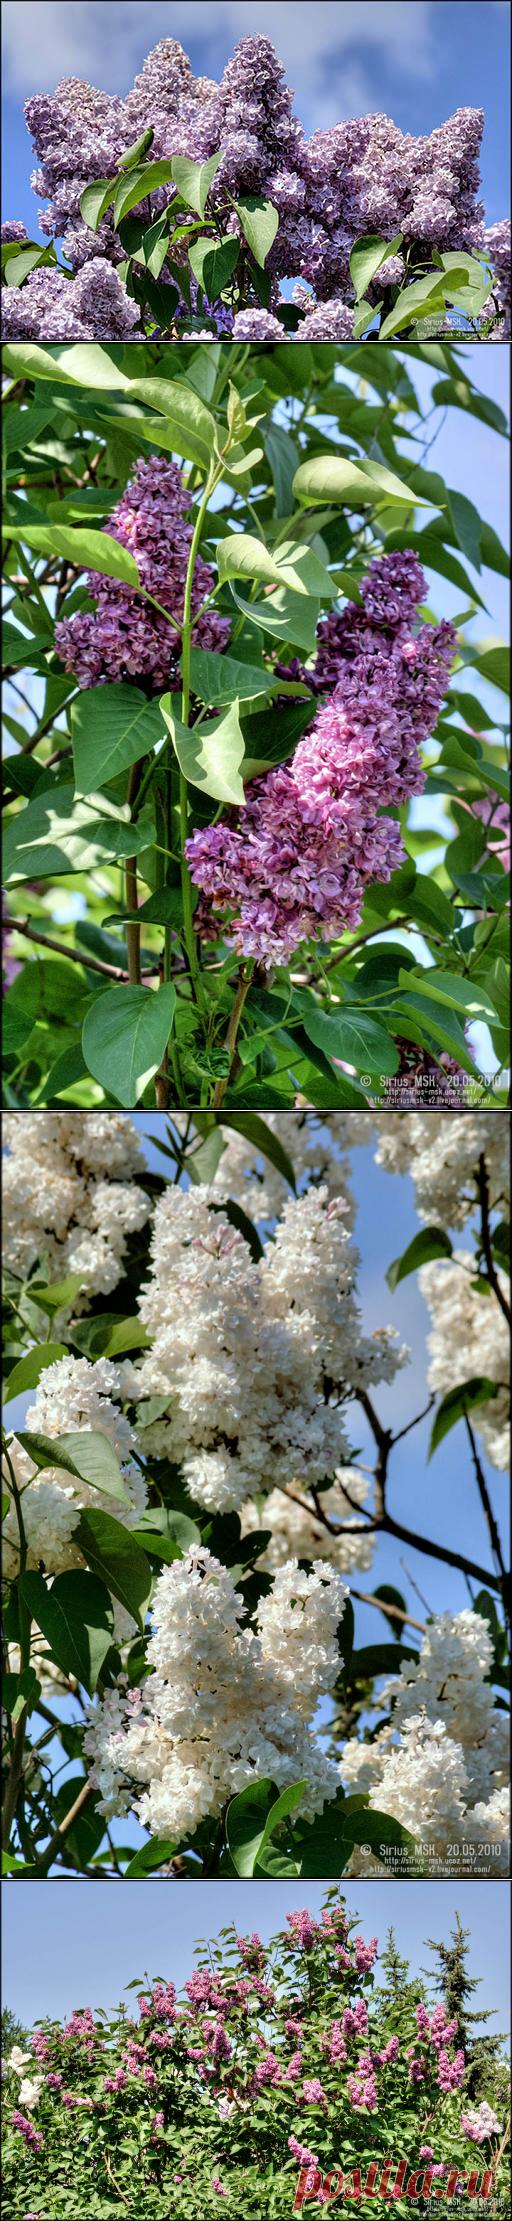 [HDR] 2010-05-20, ч. 3 | Сиреневый сад (восточная часть).: mskparksphoto